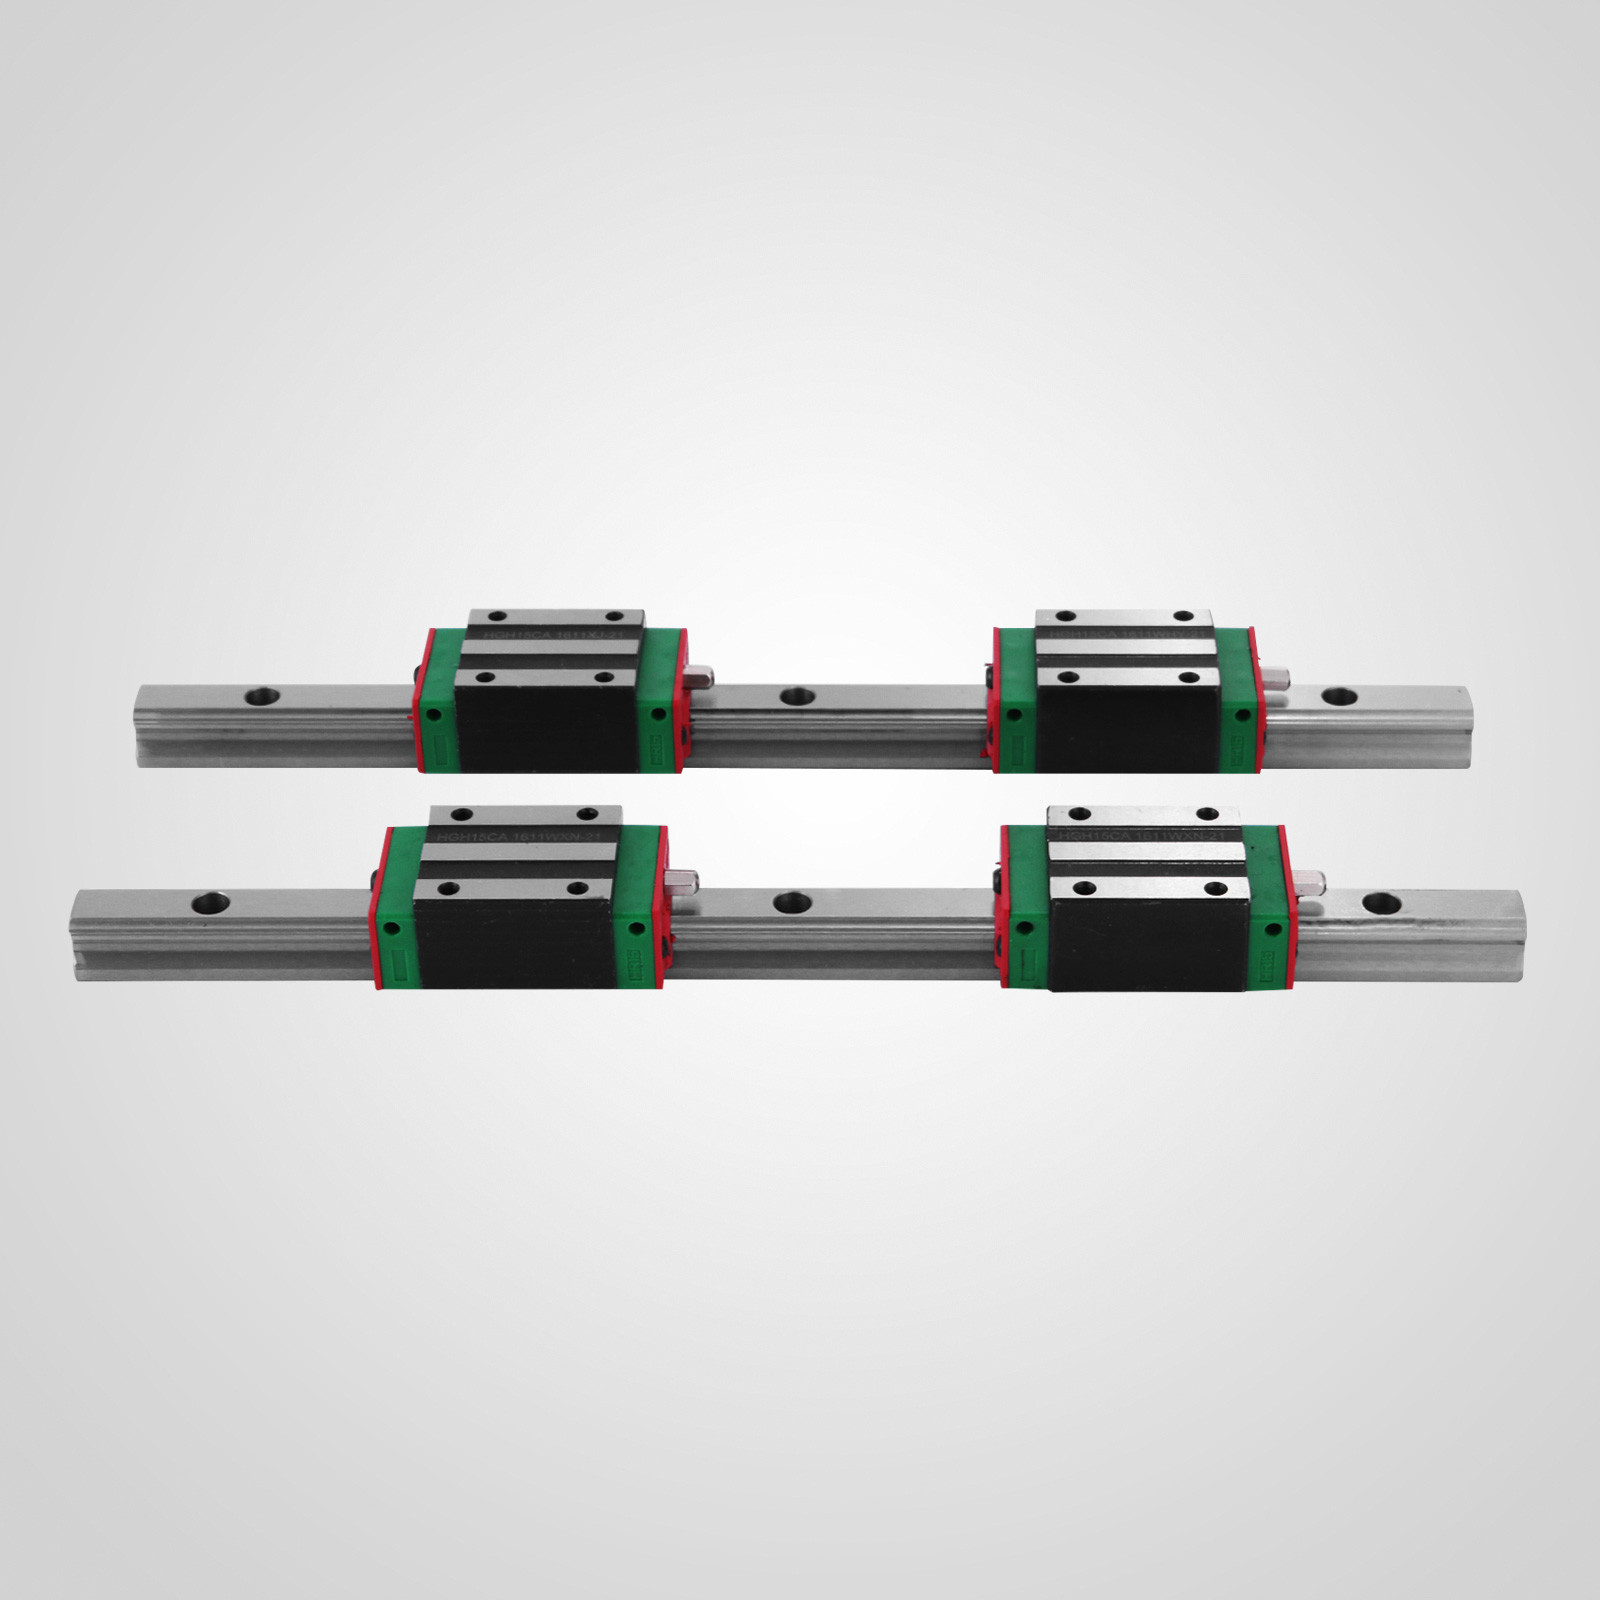 CNC Set 15-650mm 2x Linear Guideway Rail 4x Square type carriage bearing block